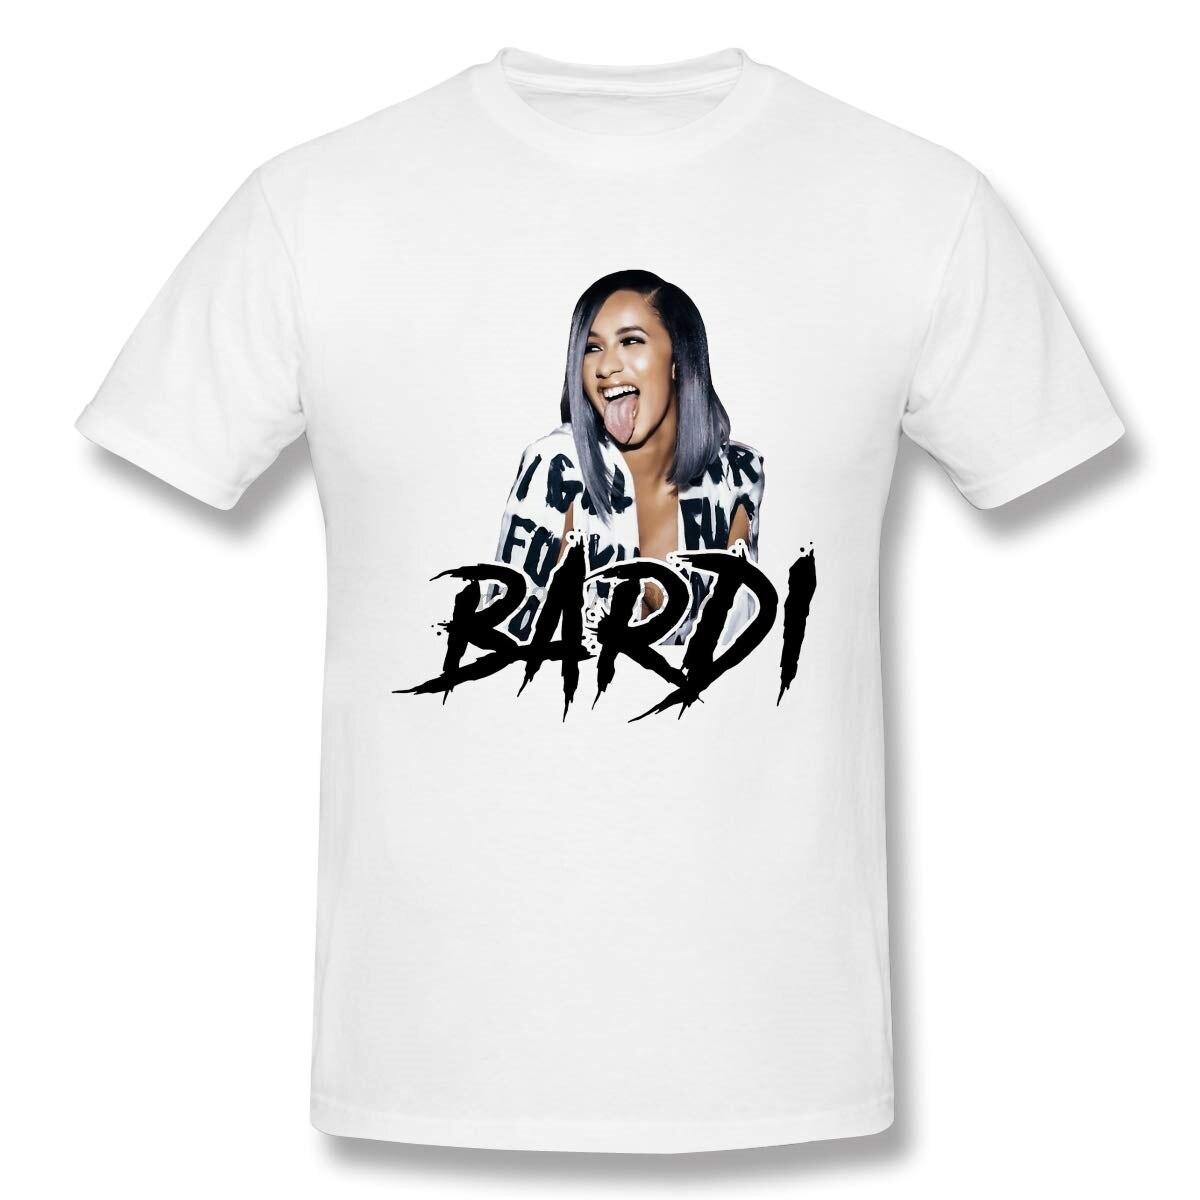 Cool Bardi Gang Cardi B hombre de manga corta estándar camiseta blanca